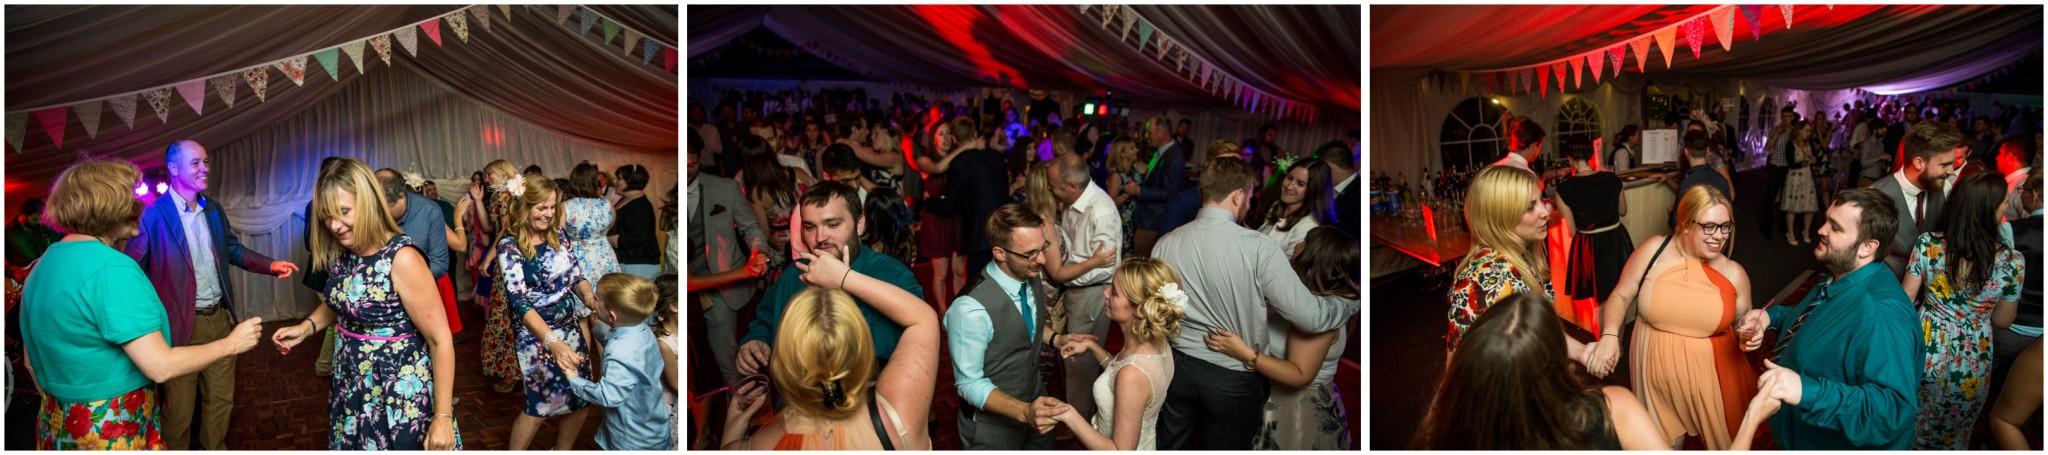 Tournerbury Woods Estate Wedding Evening Party